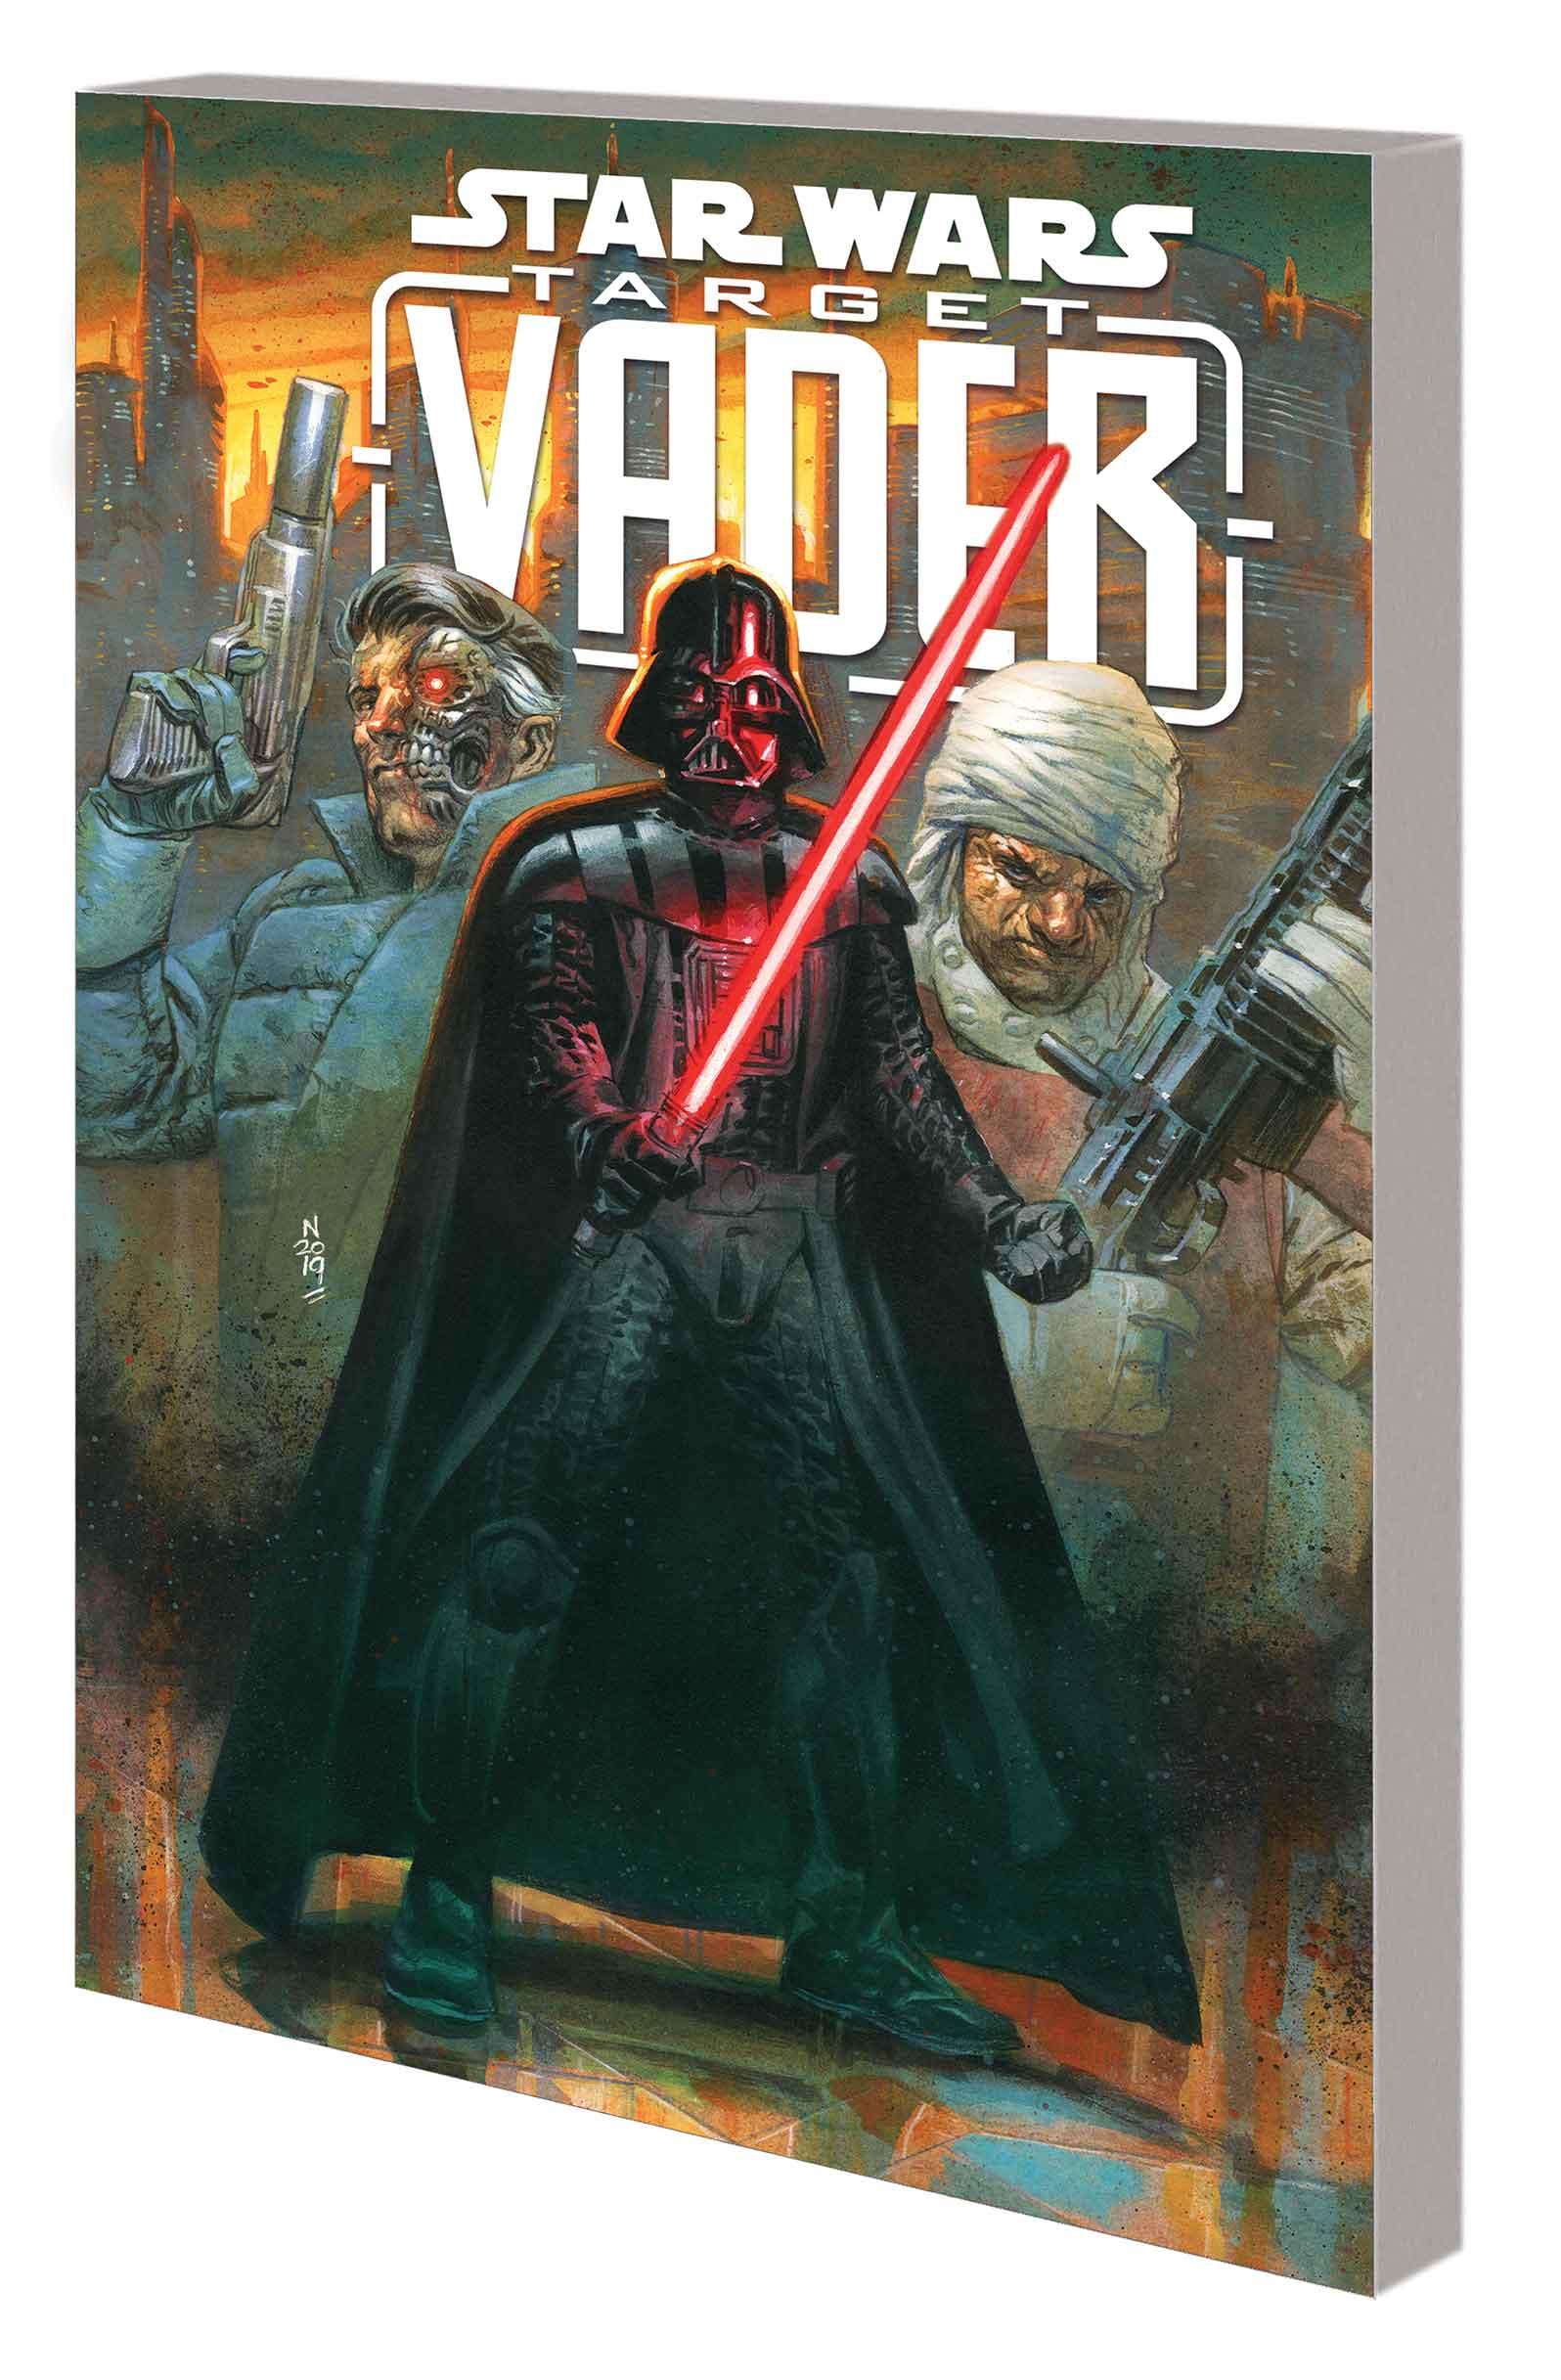 December S Comics Aphra Ends As Kylo Rises A New Era In Star Wars Comics Begins Fantha Tracks